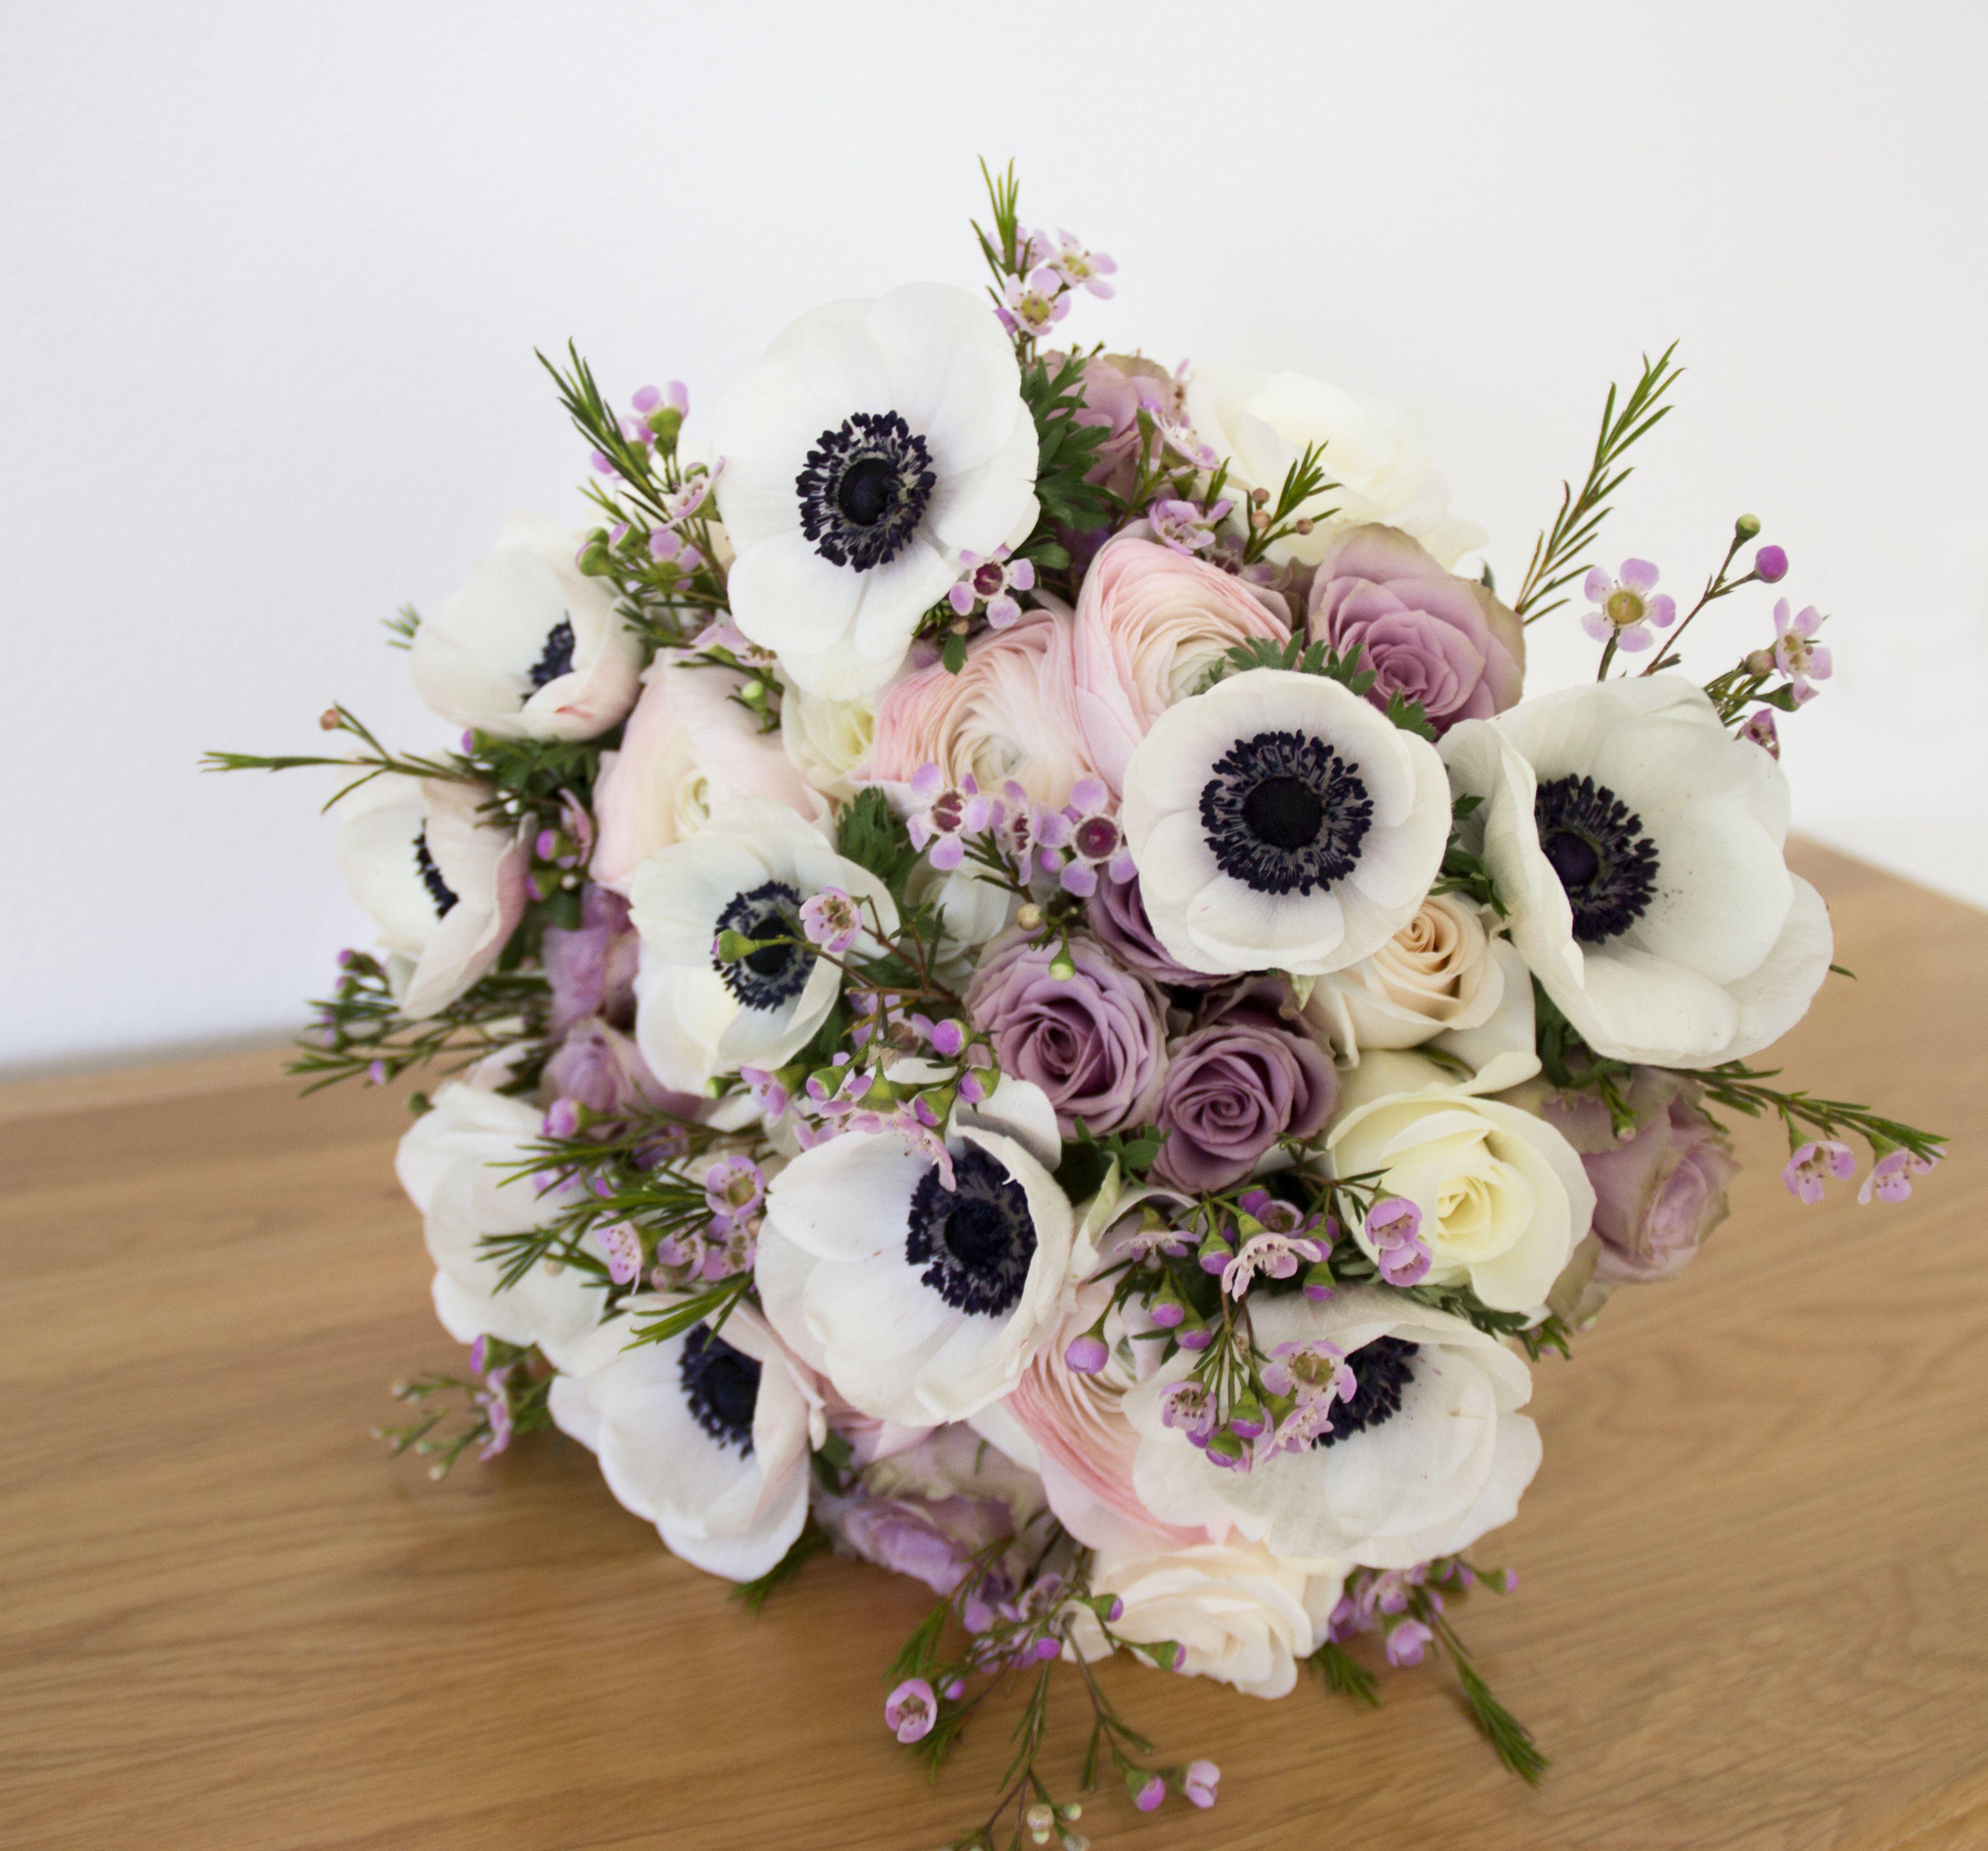 vintage romantic white pink winter spring wedding bridal bouquet with anemones ranunculus